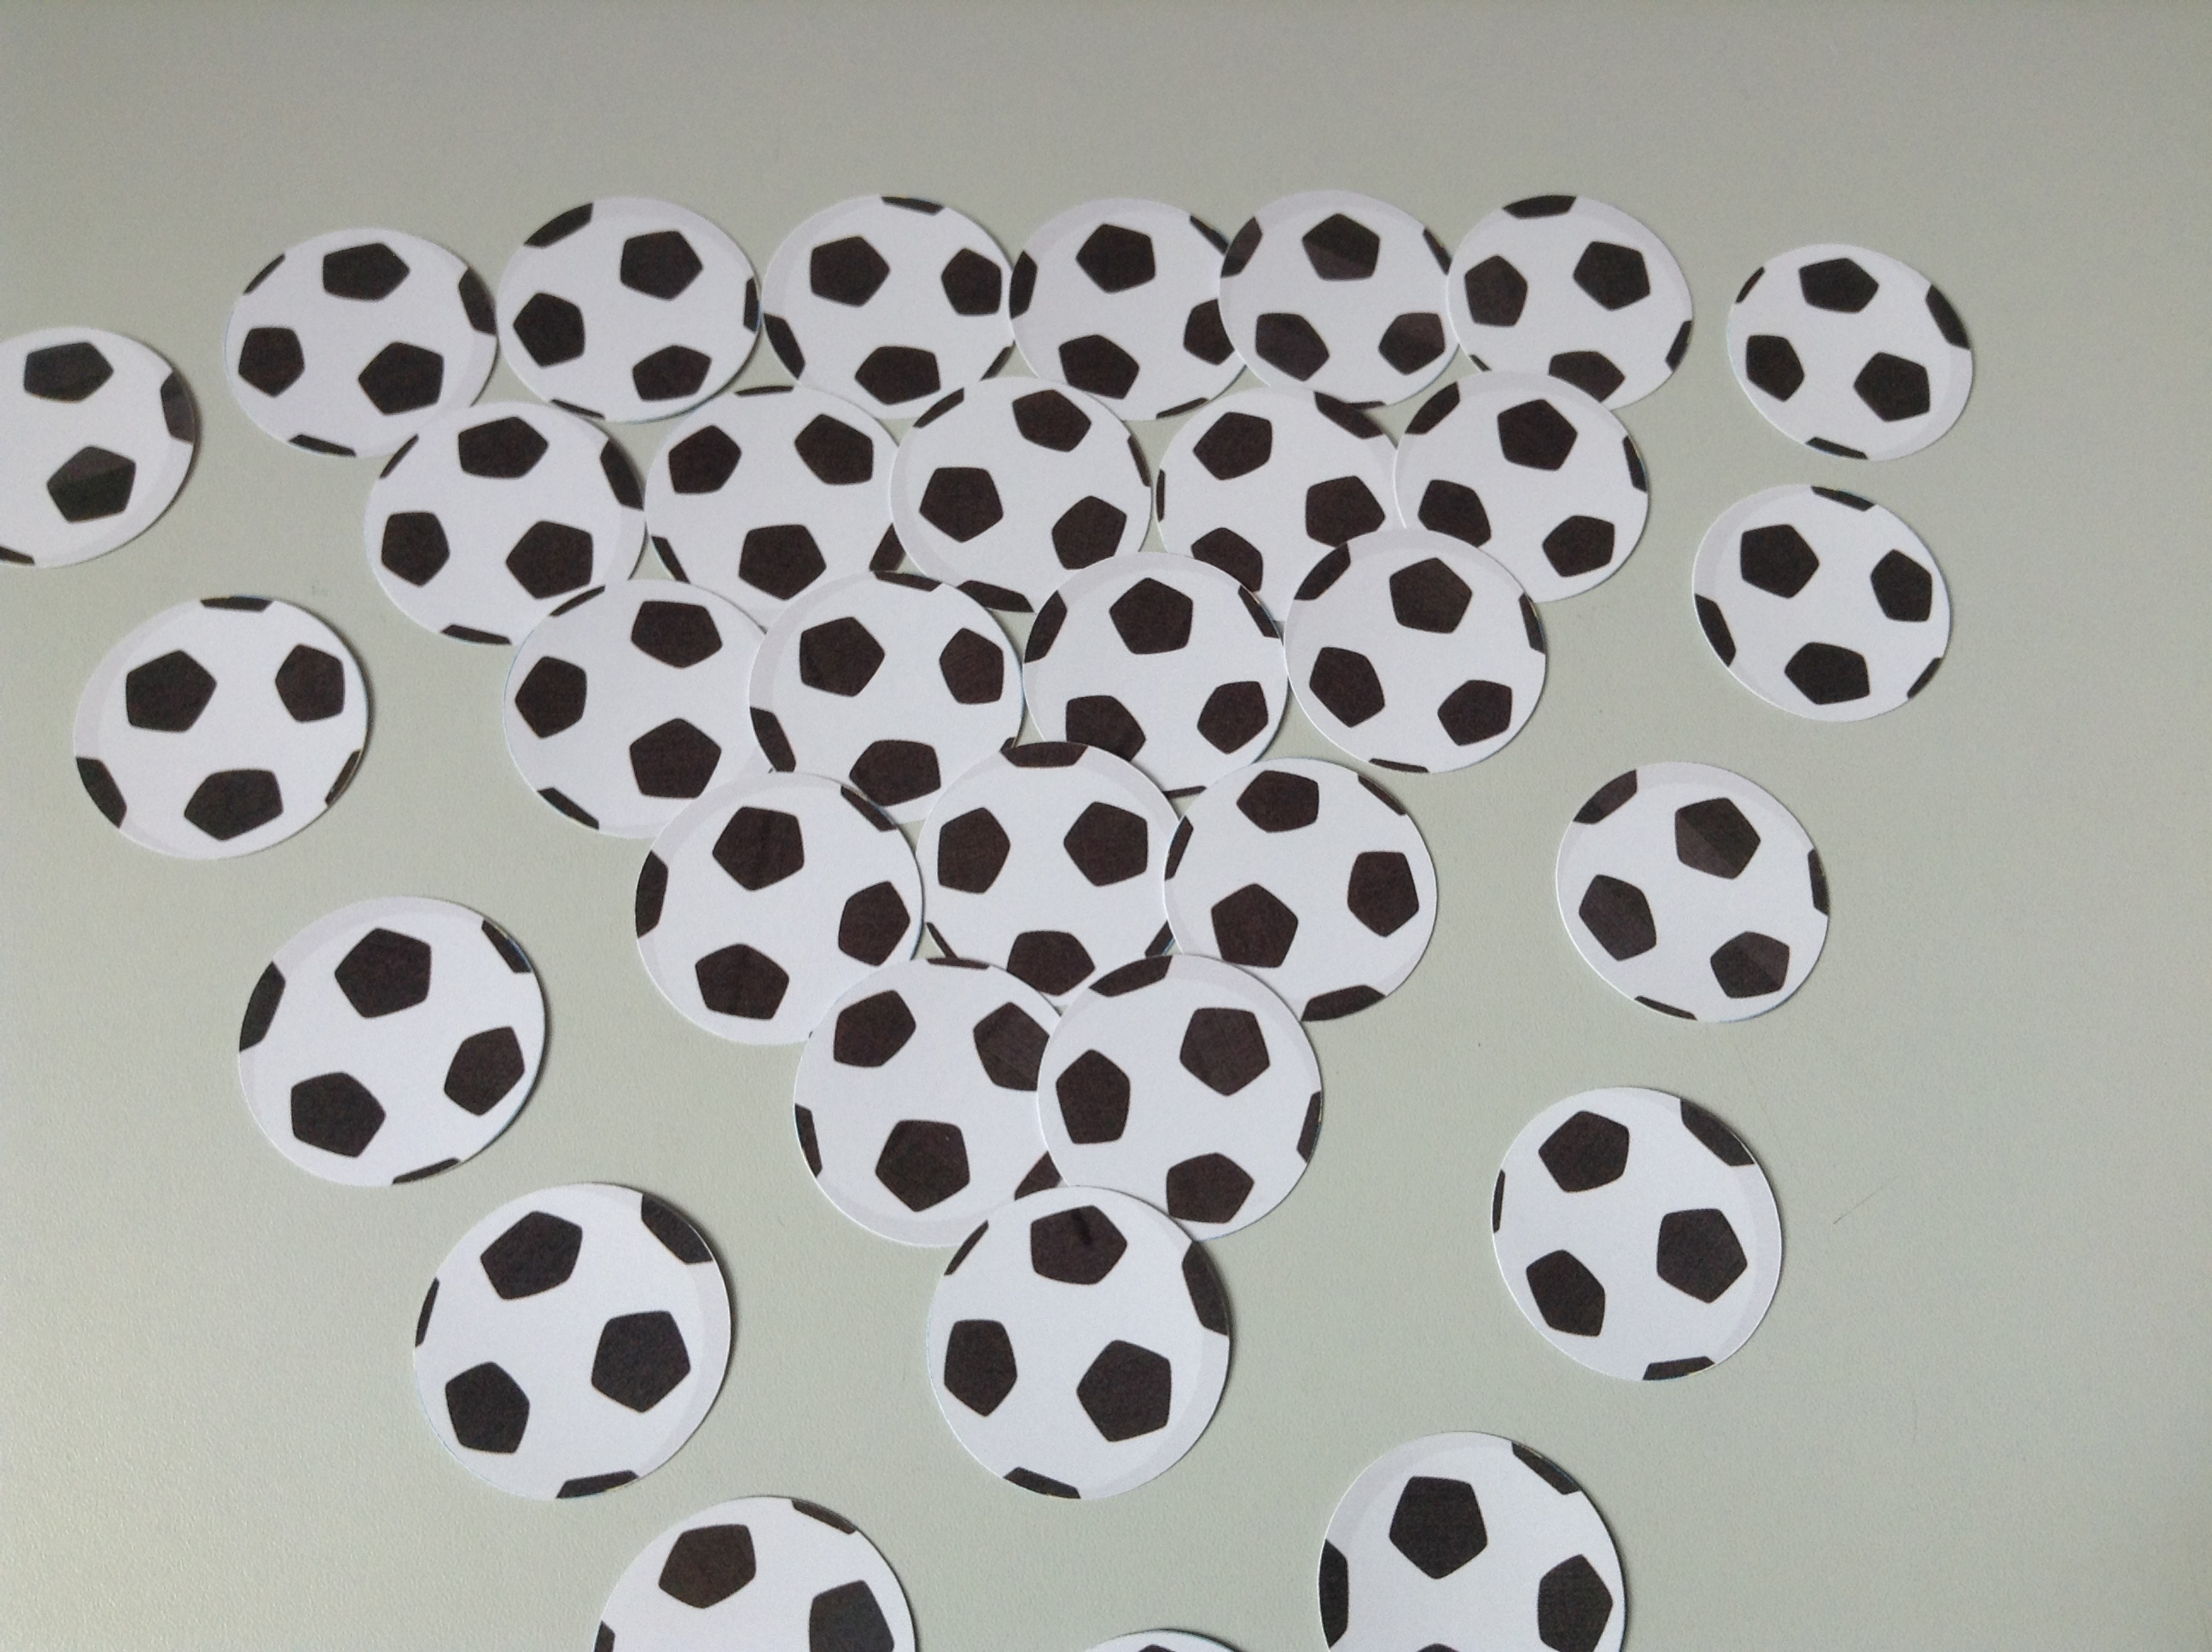 06c9282ce0 Adesivo Bola de Futebol